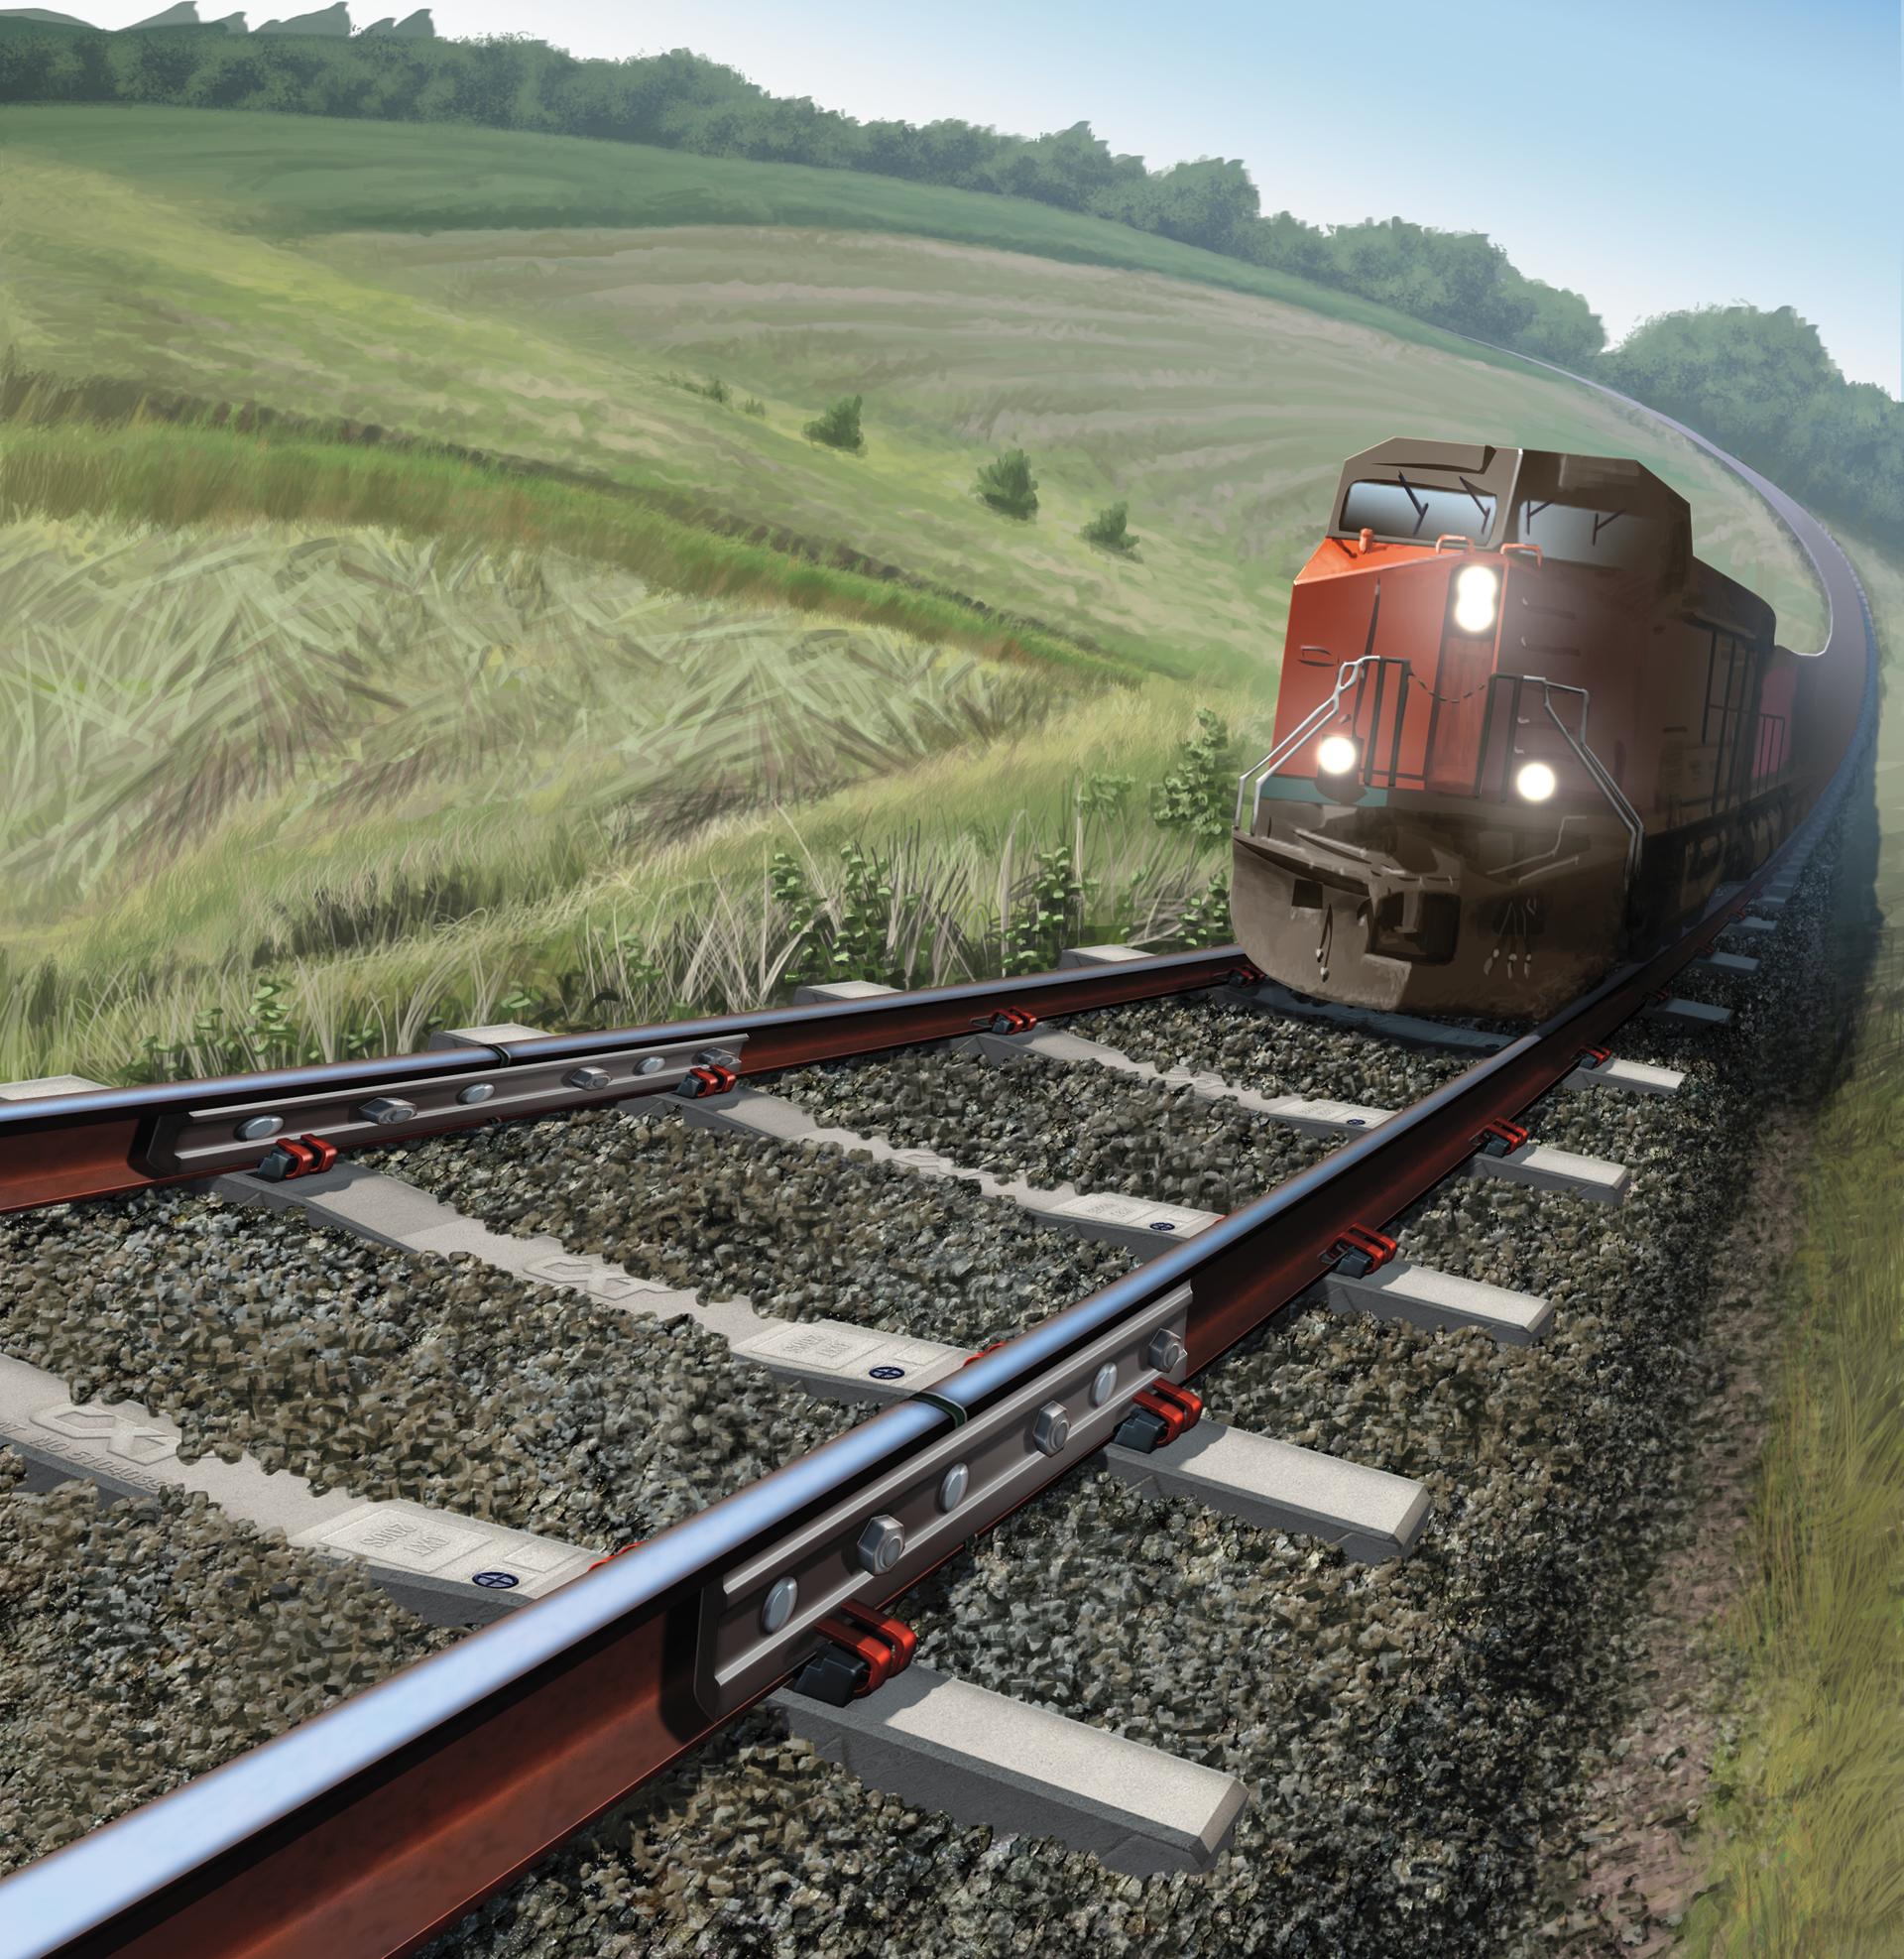 Insulated Rail Joint, Illustration, Ninetimes, L.B. Foster Rail, Allegheney Rail Joints, Rail Scene, Rail Track, 3D Model, L.B. Foster, Rail Joint, Track